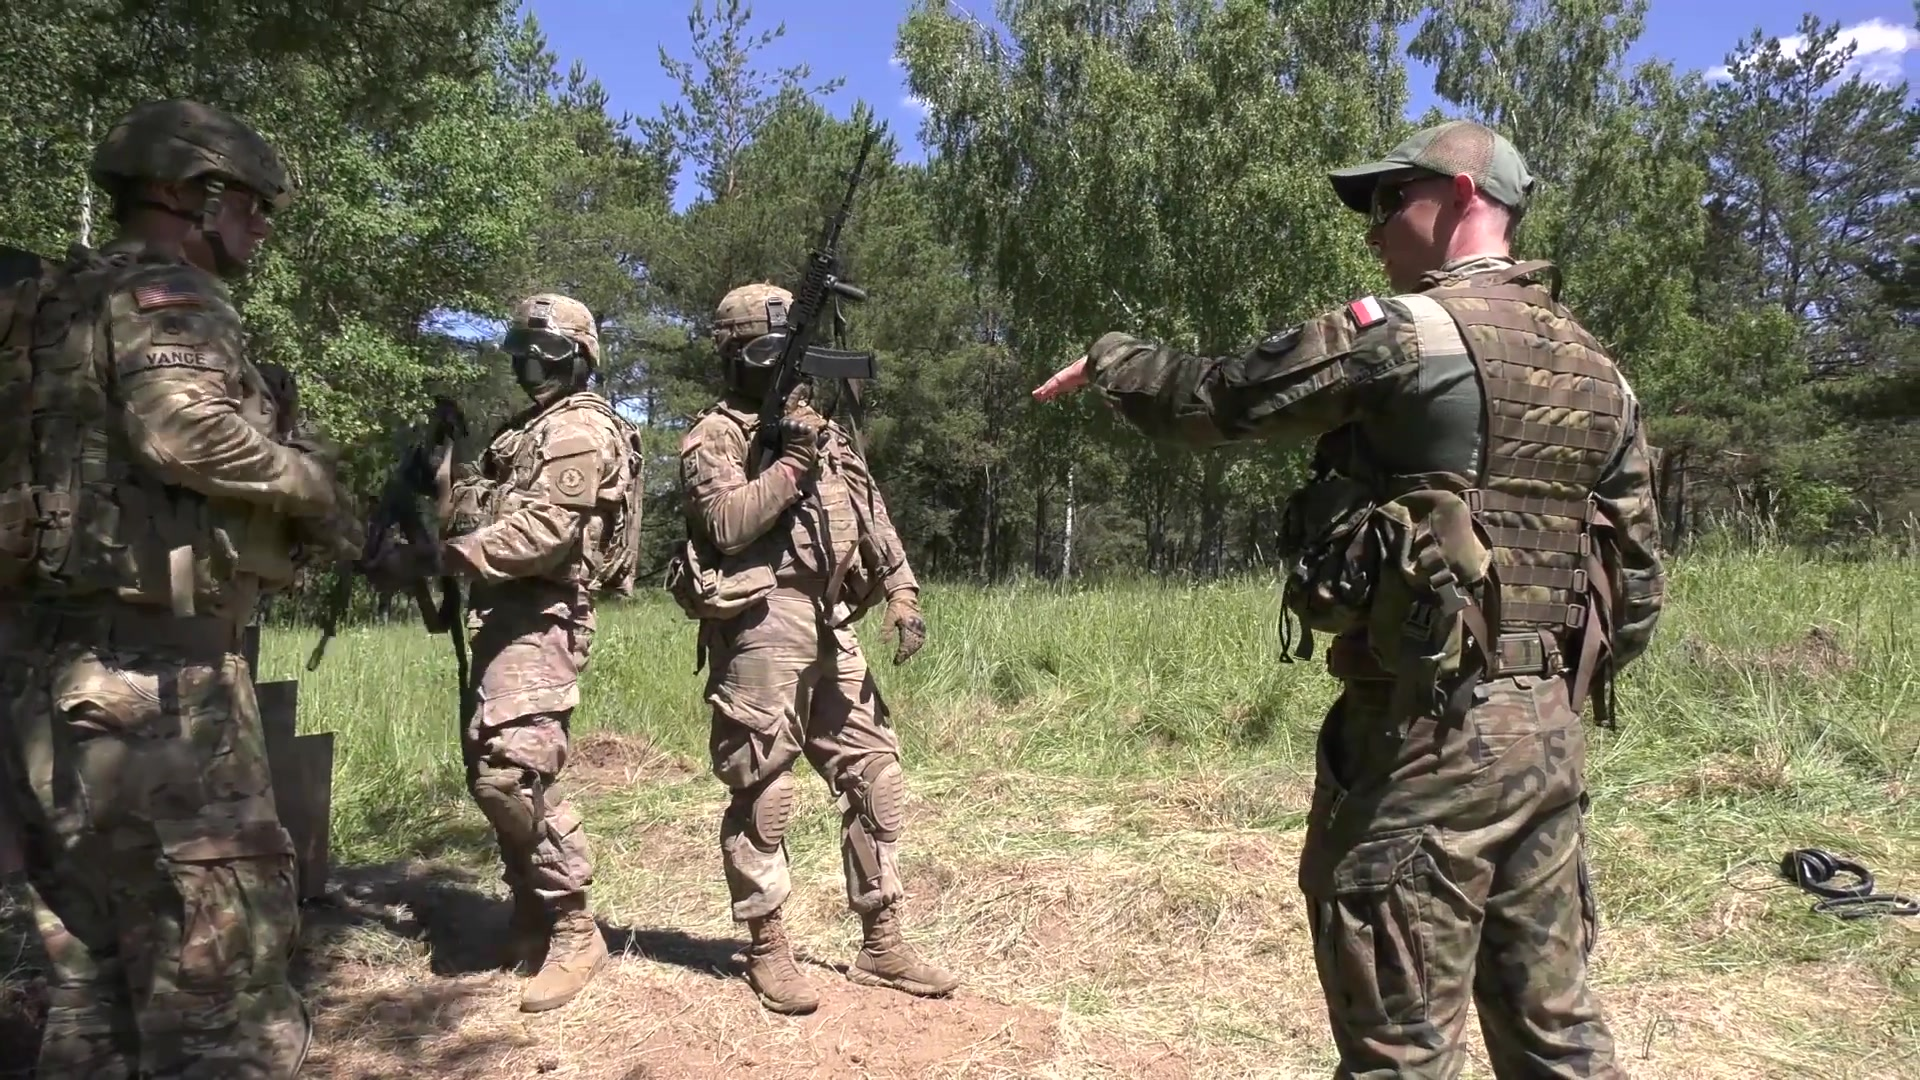 US Army Combat Engineers • Bridge Building Exercise • Time-Lapse